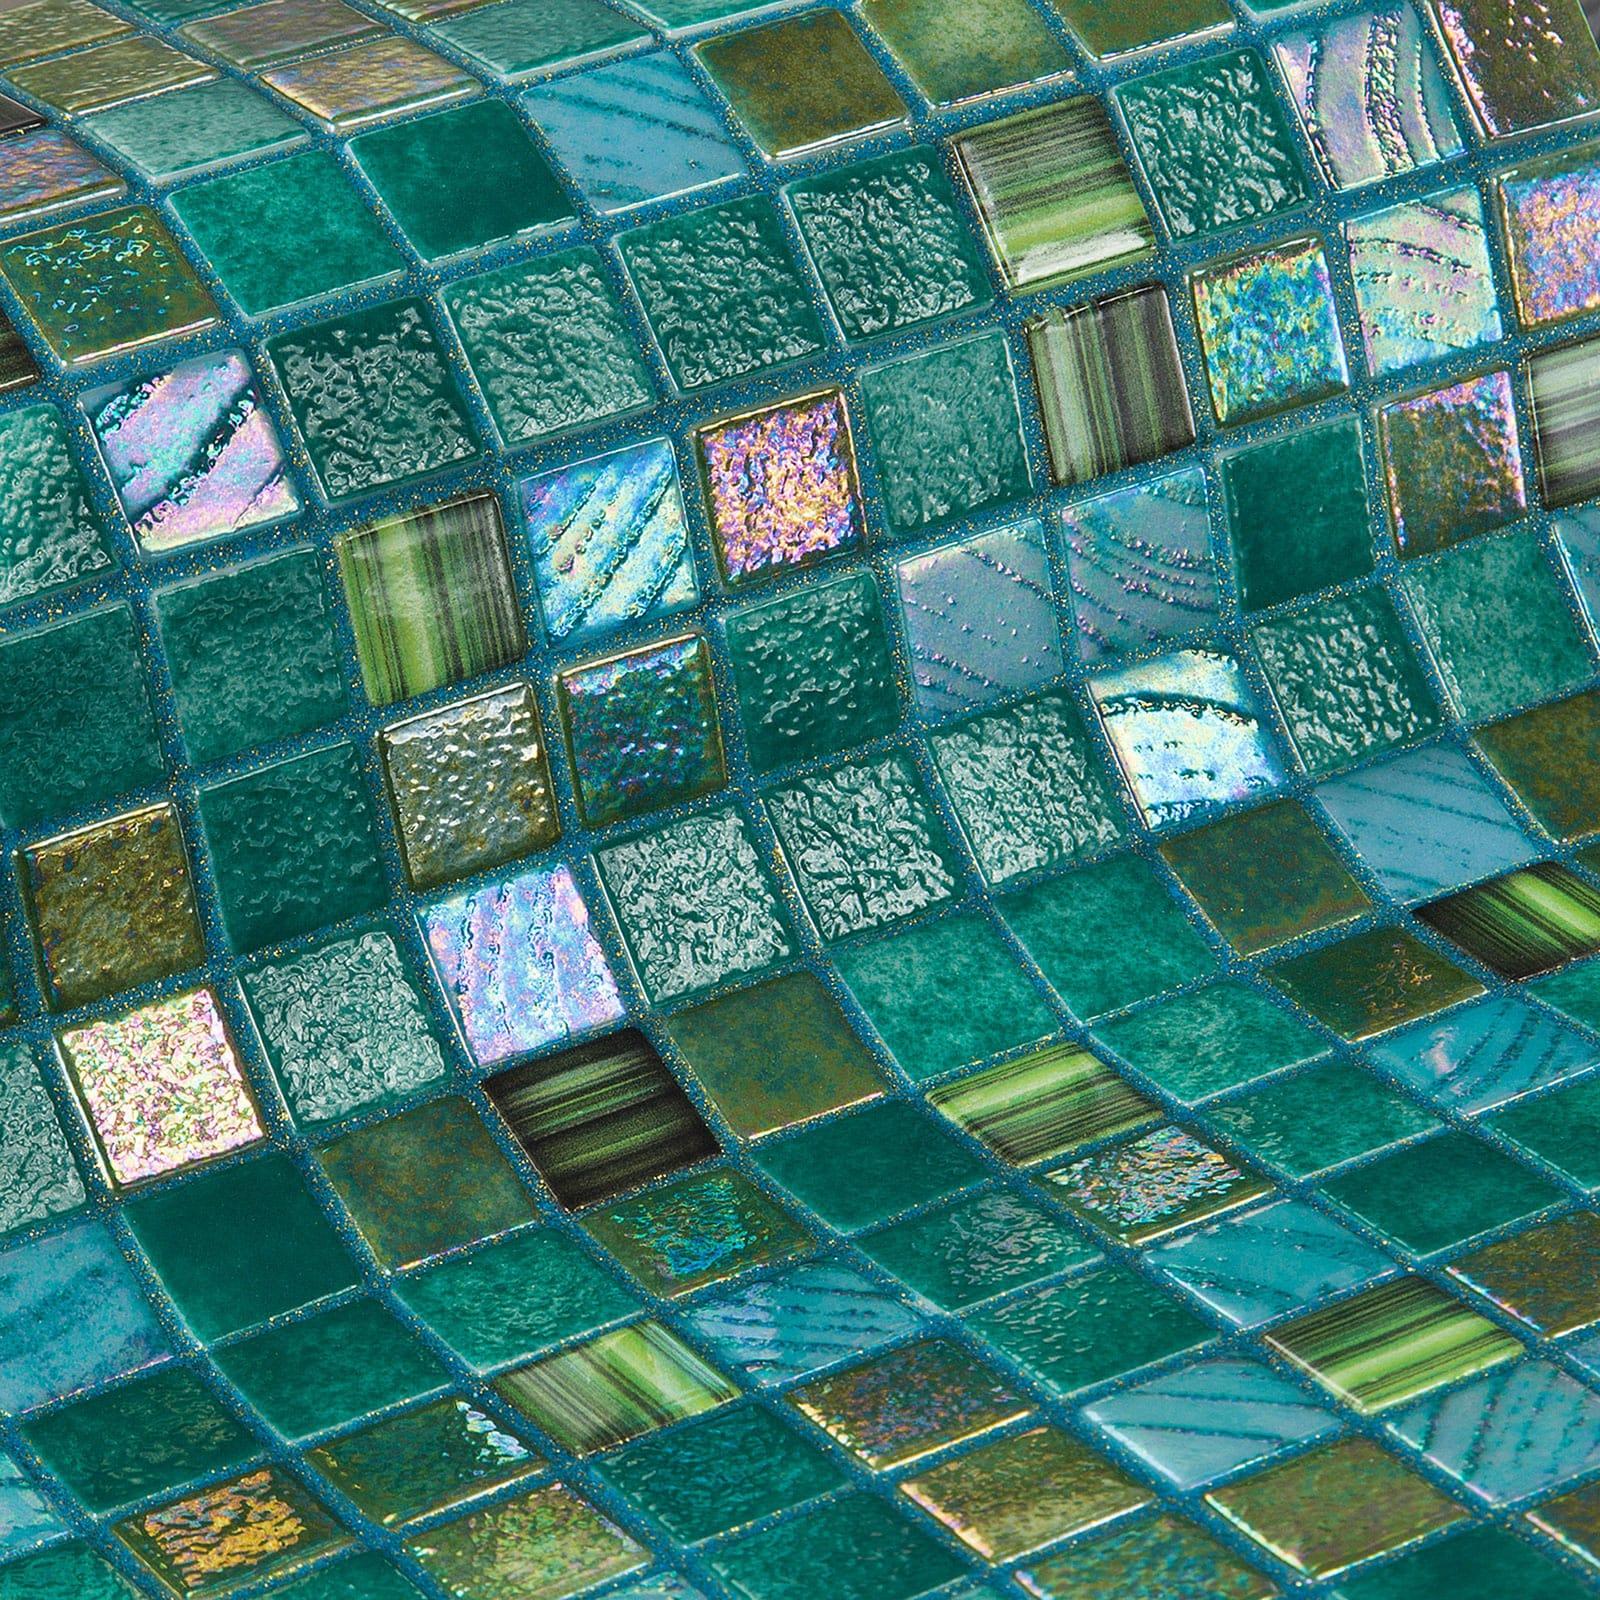 12-Kiwi-Topping-Mosaic-Ezarri.jpg